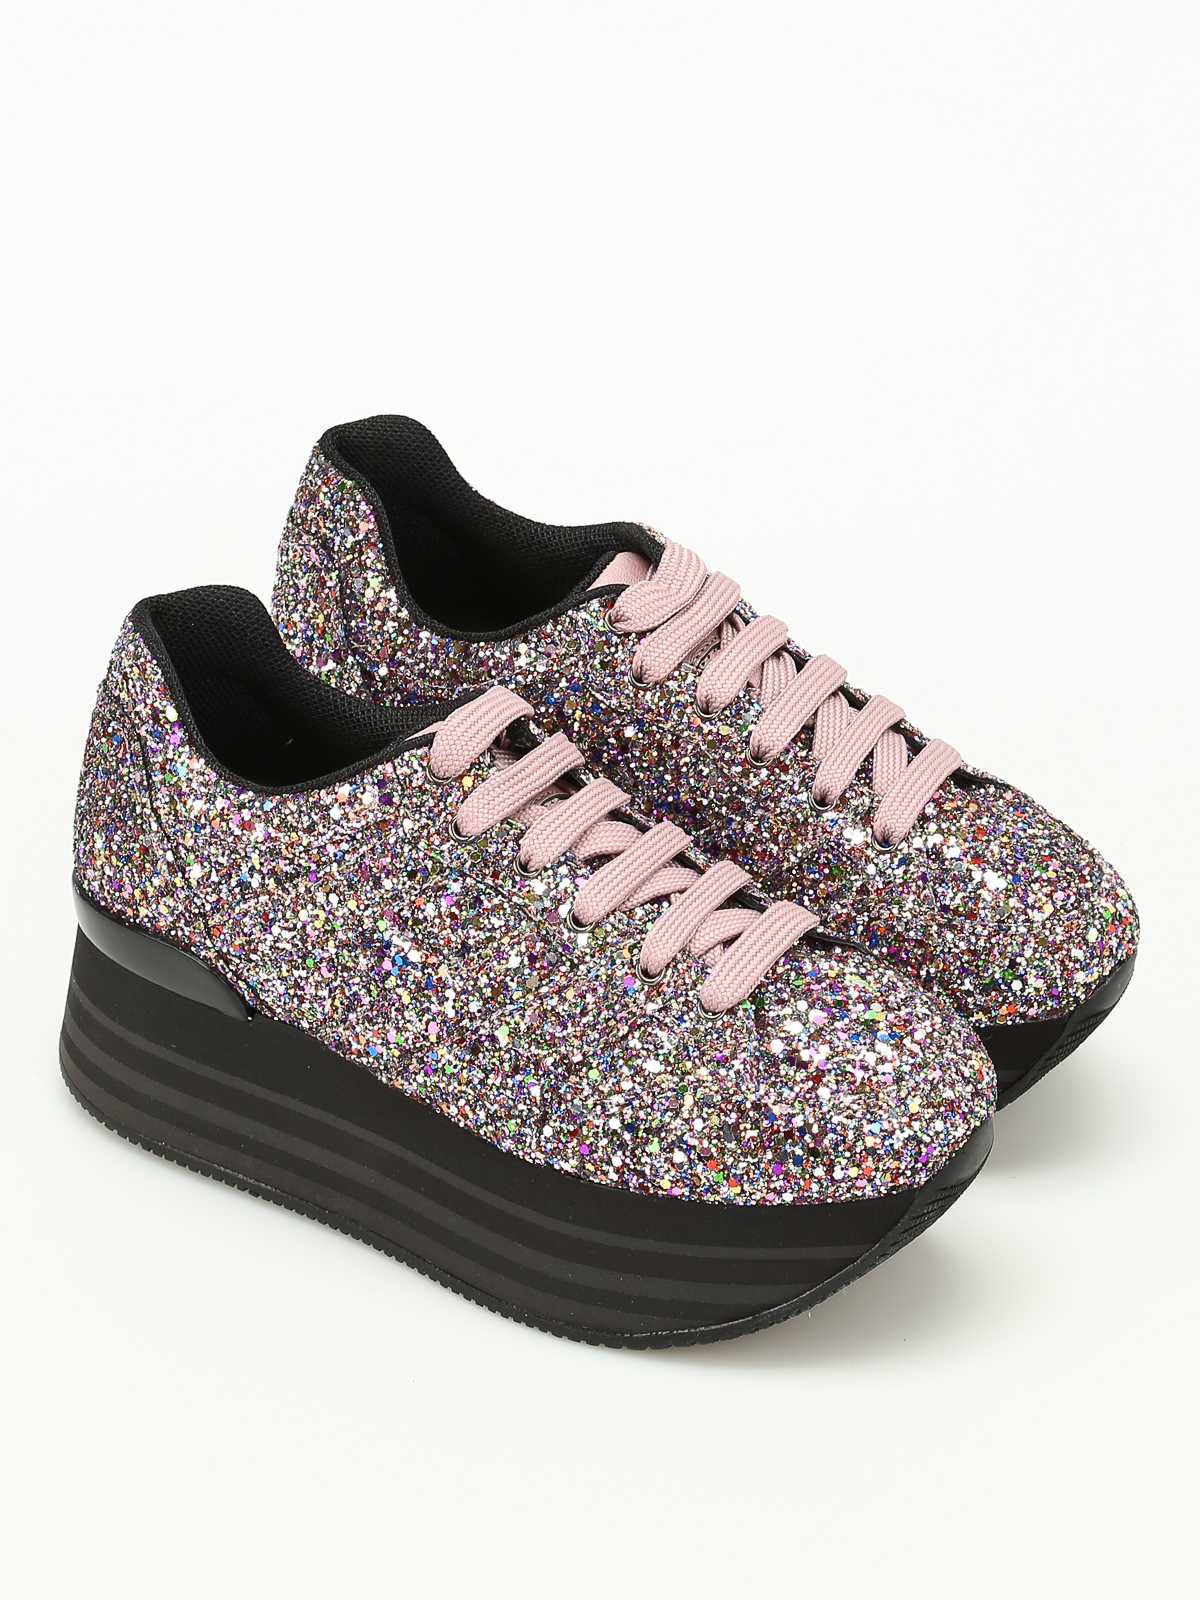 Trainers Hogan - H283 maxi glitter suede sneakers - HXW2830T548HYM0LMD